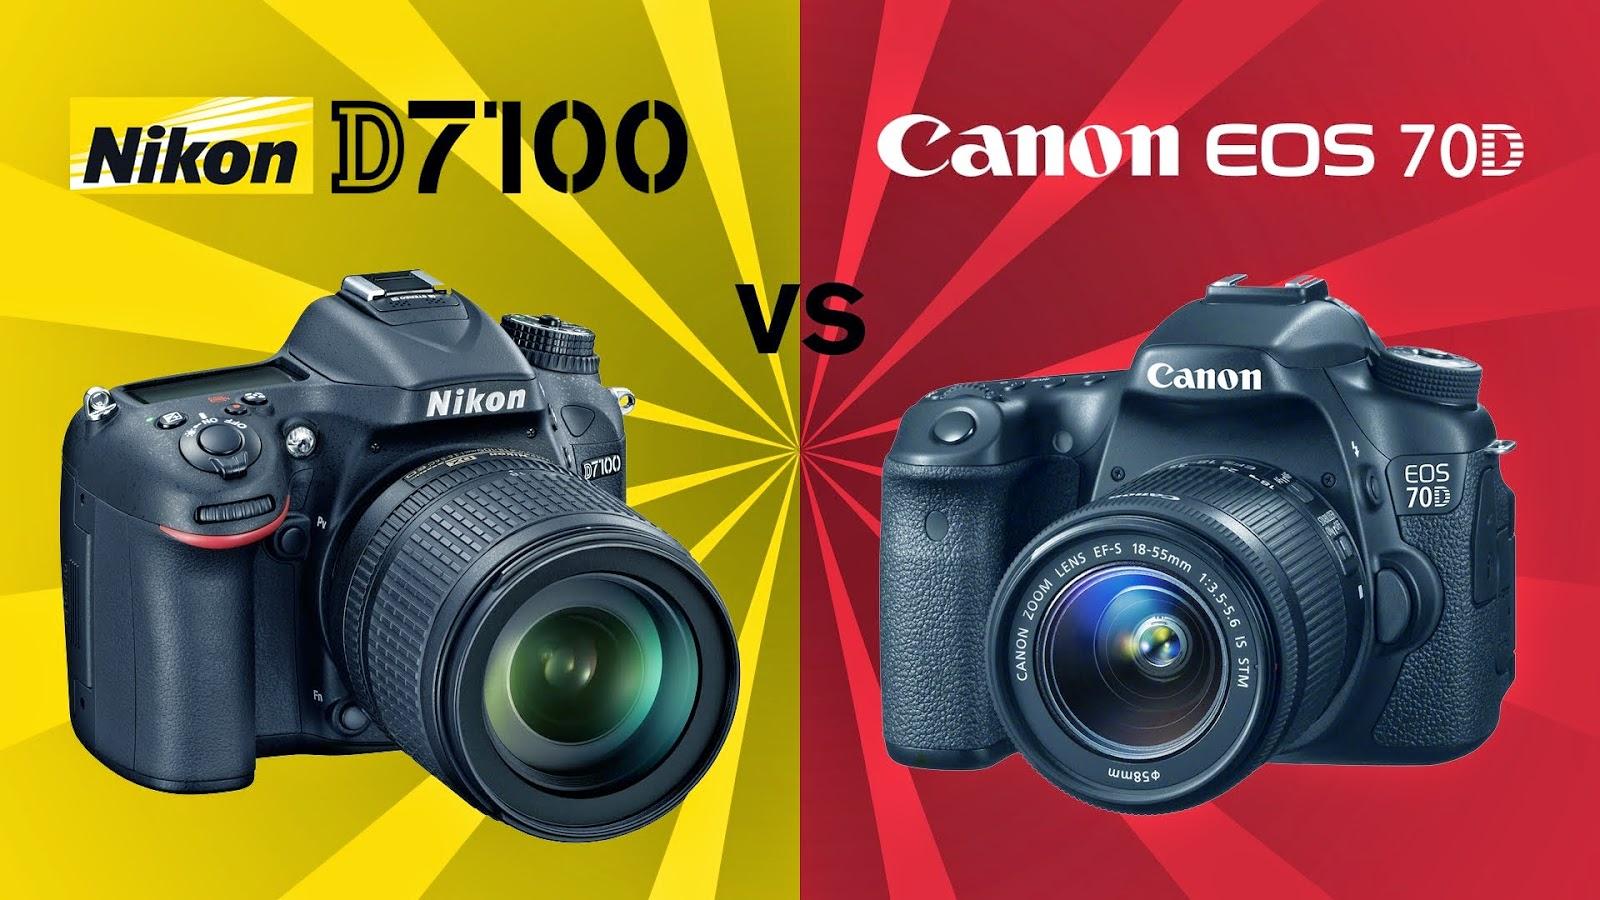 Camera Comparison Of Canon And Nikon Dslr Cameras canon vs nikon between myth and reality gadgets digital review dslr